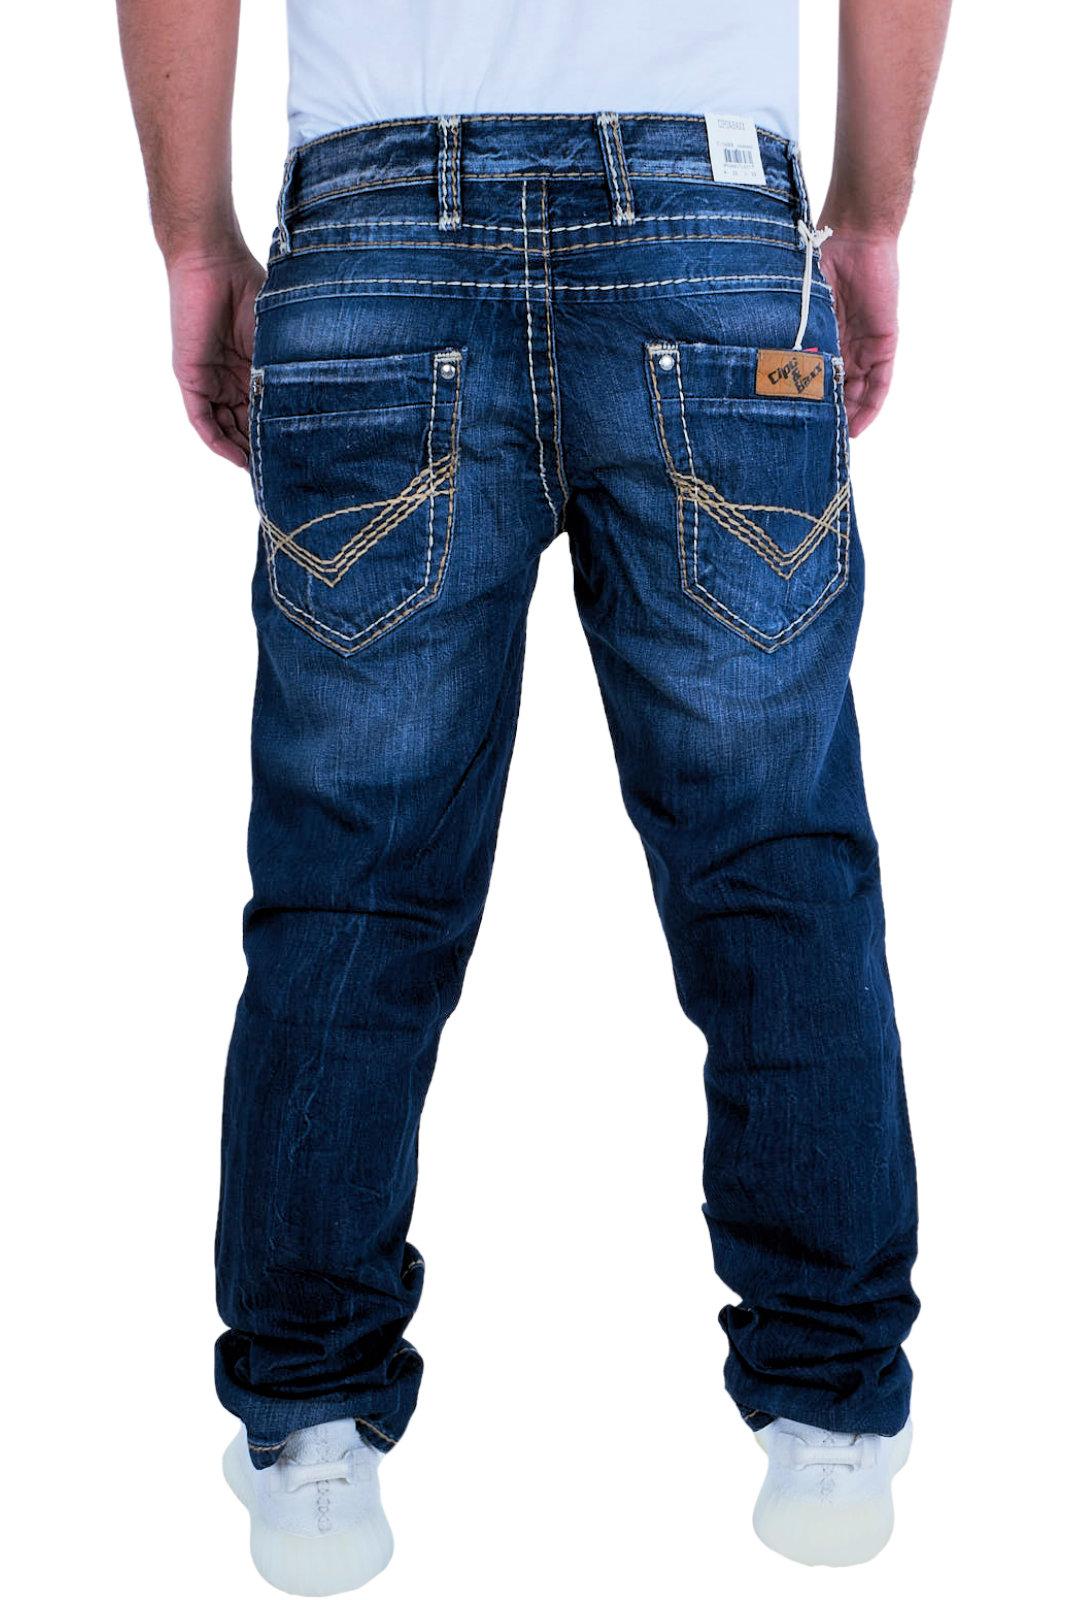 CIPO & BAXX Herren Jeans Clubwear Denim Hose C-0688 Straight Straight Straight Dicke Naht Designer 95e8cb